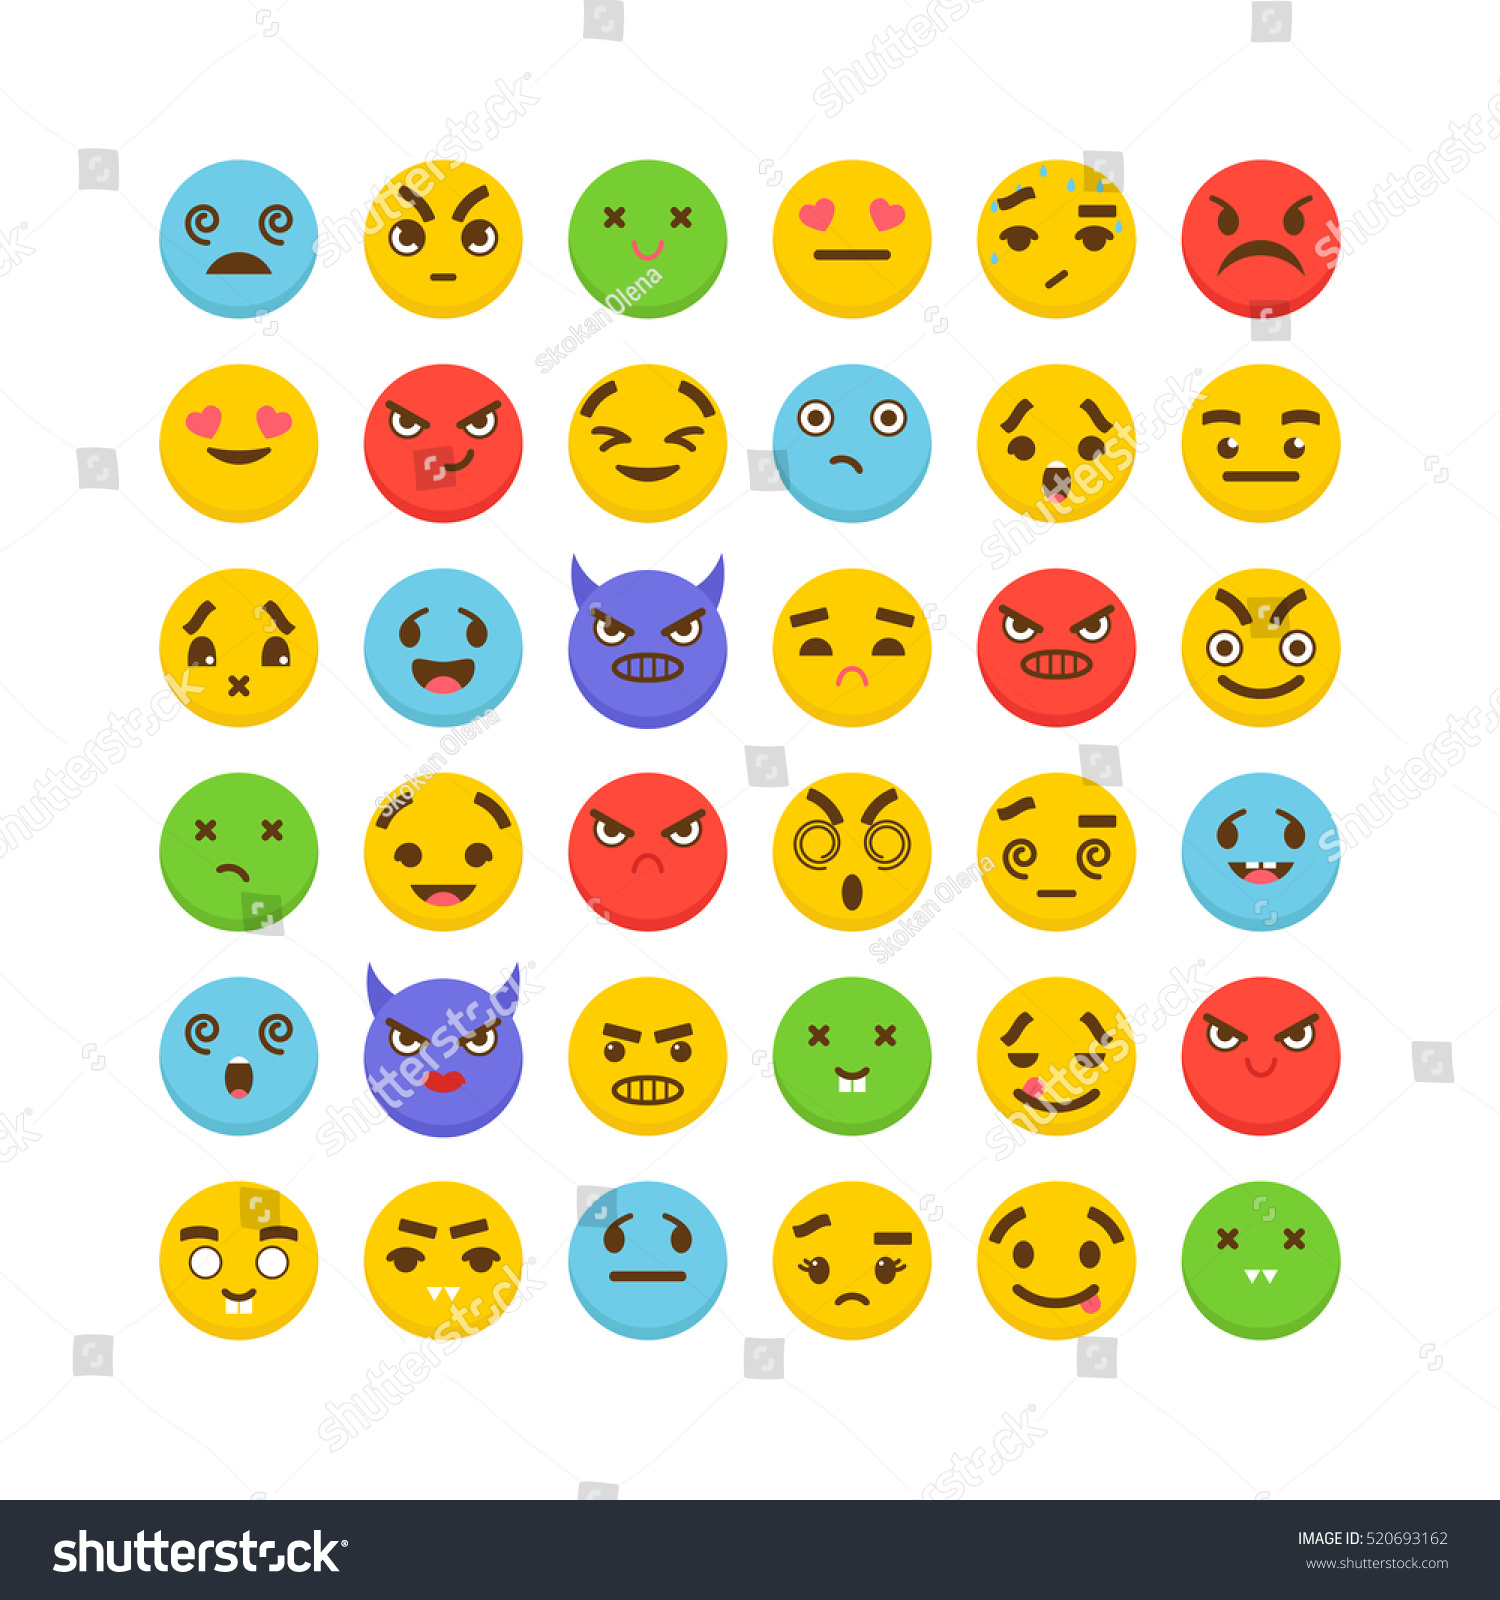 set of emoticons cute emoji icons flat design kawaii vector illustration